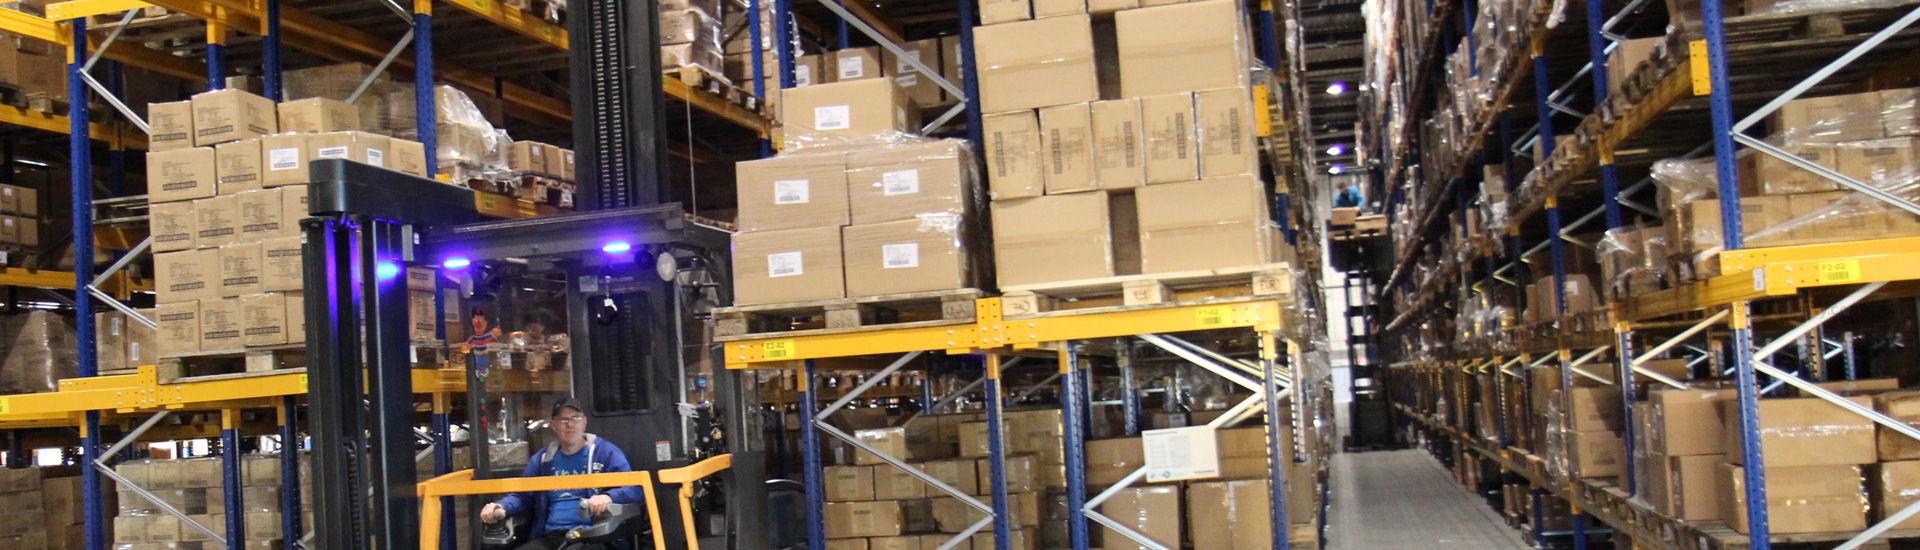 4-DistriParty-Storagepall2